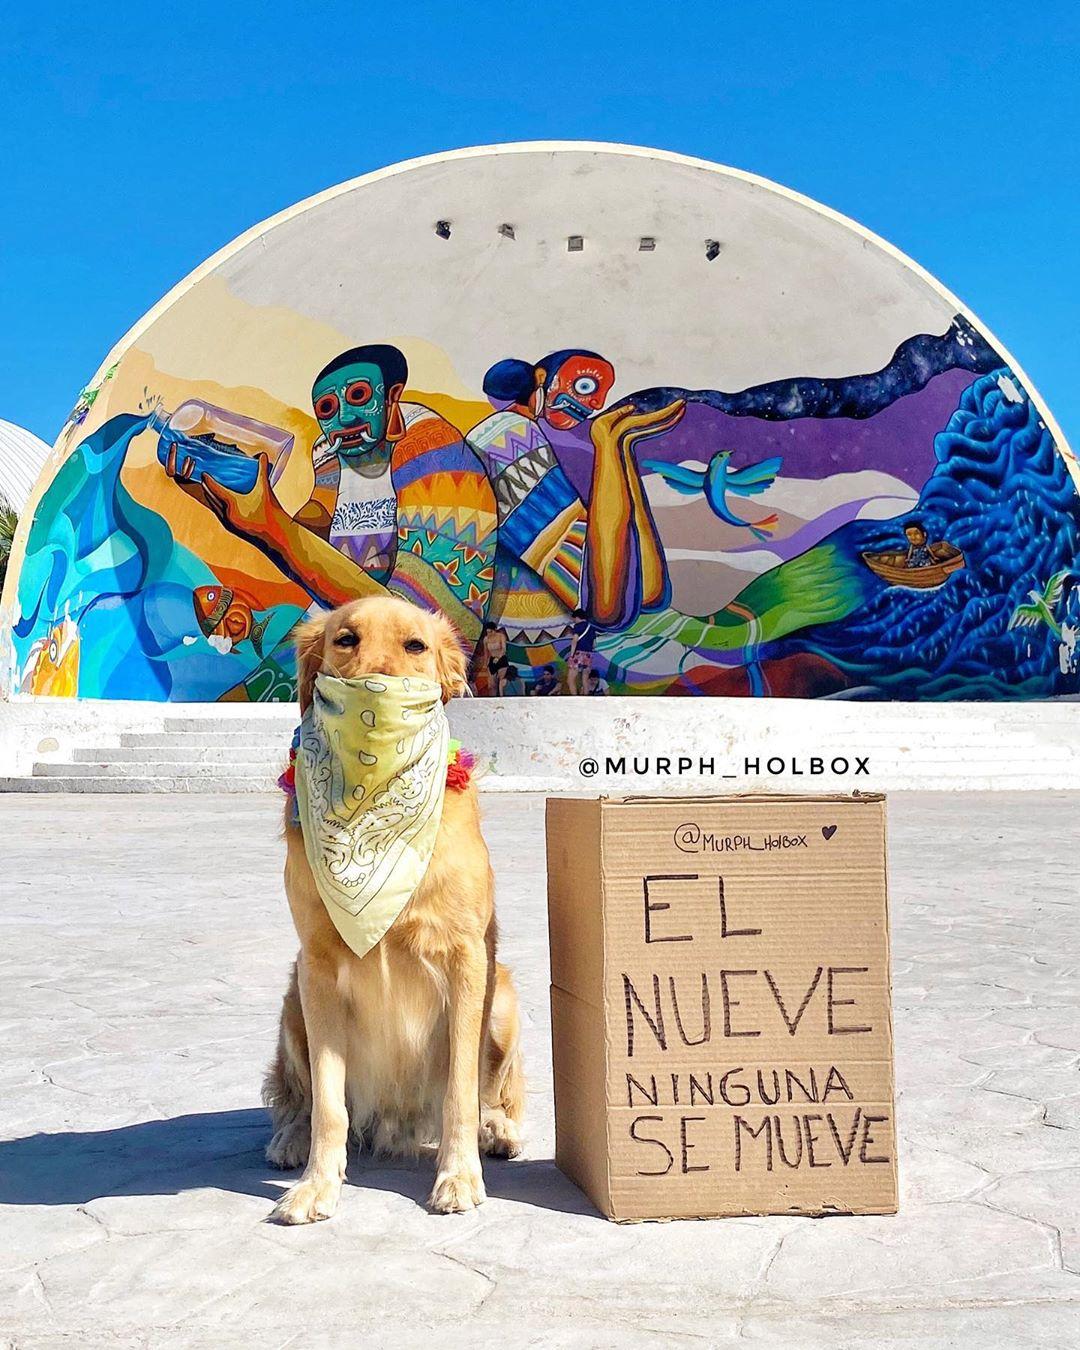 dog from holbox, murph murphy retriever holbox island top yucatan